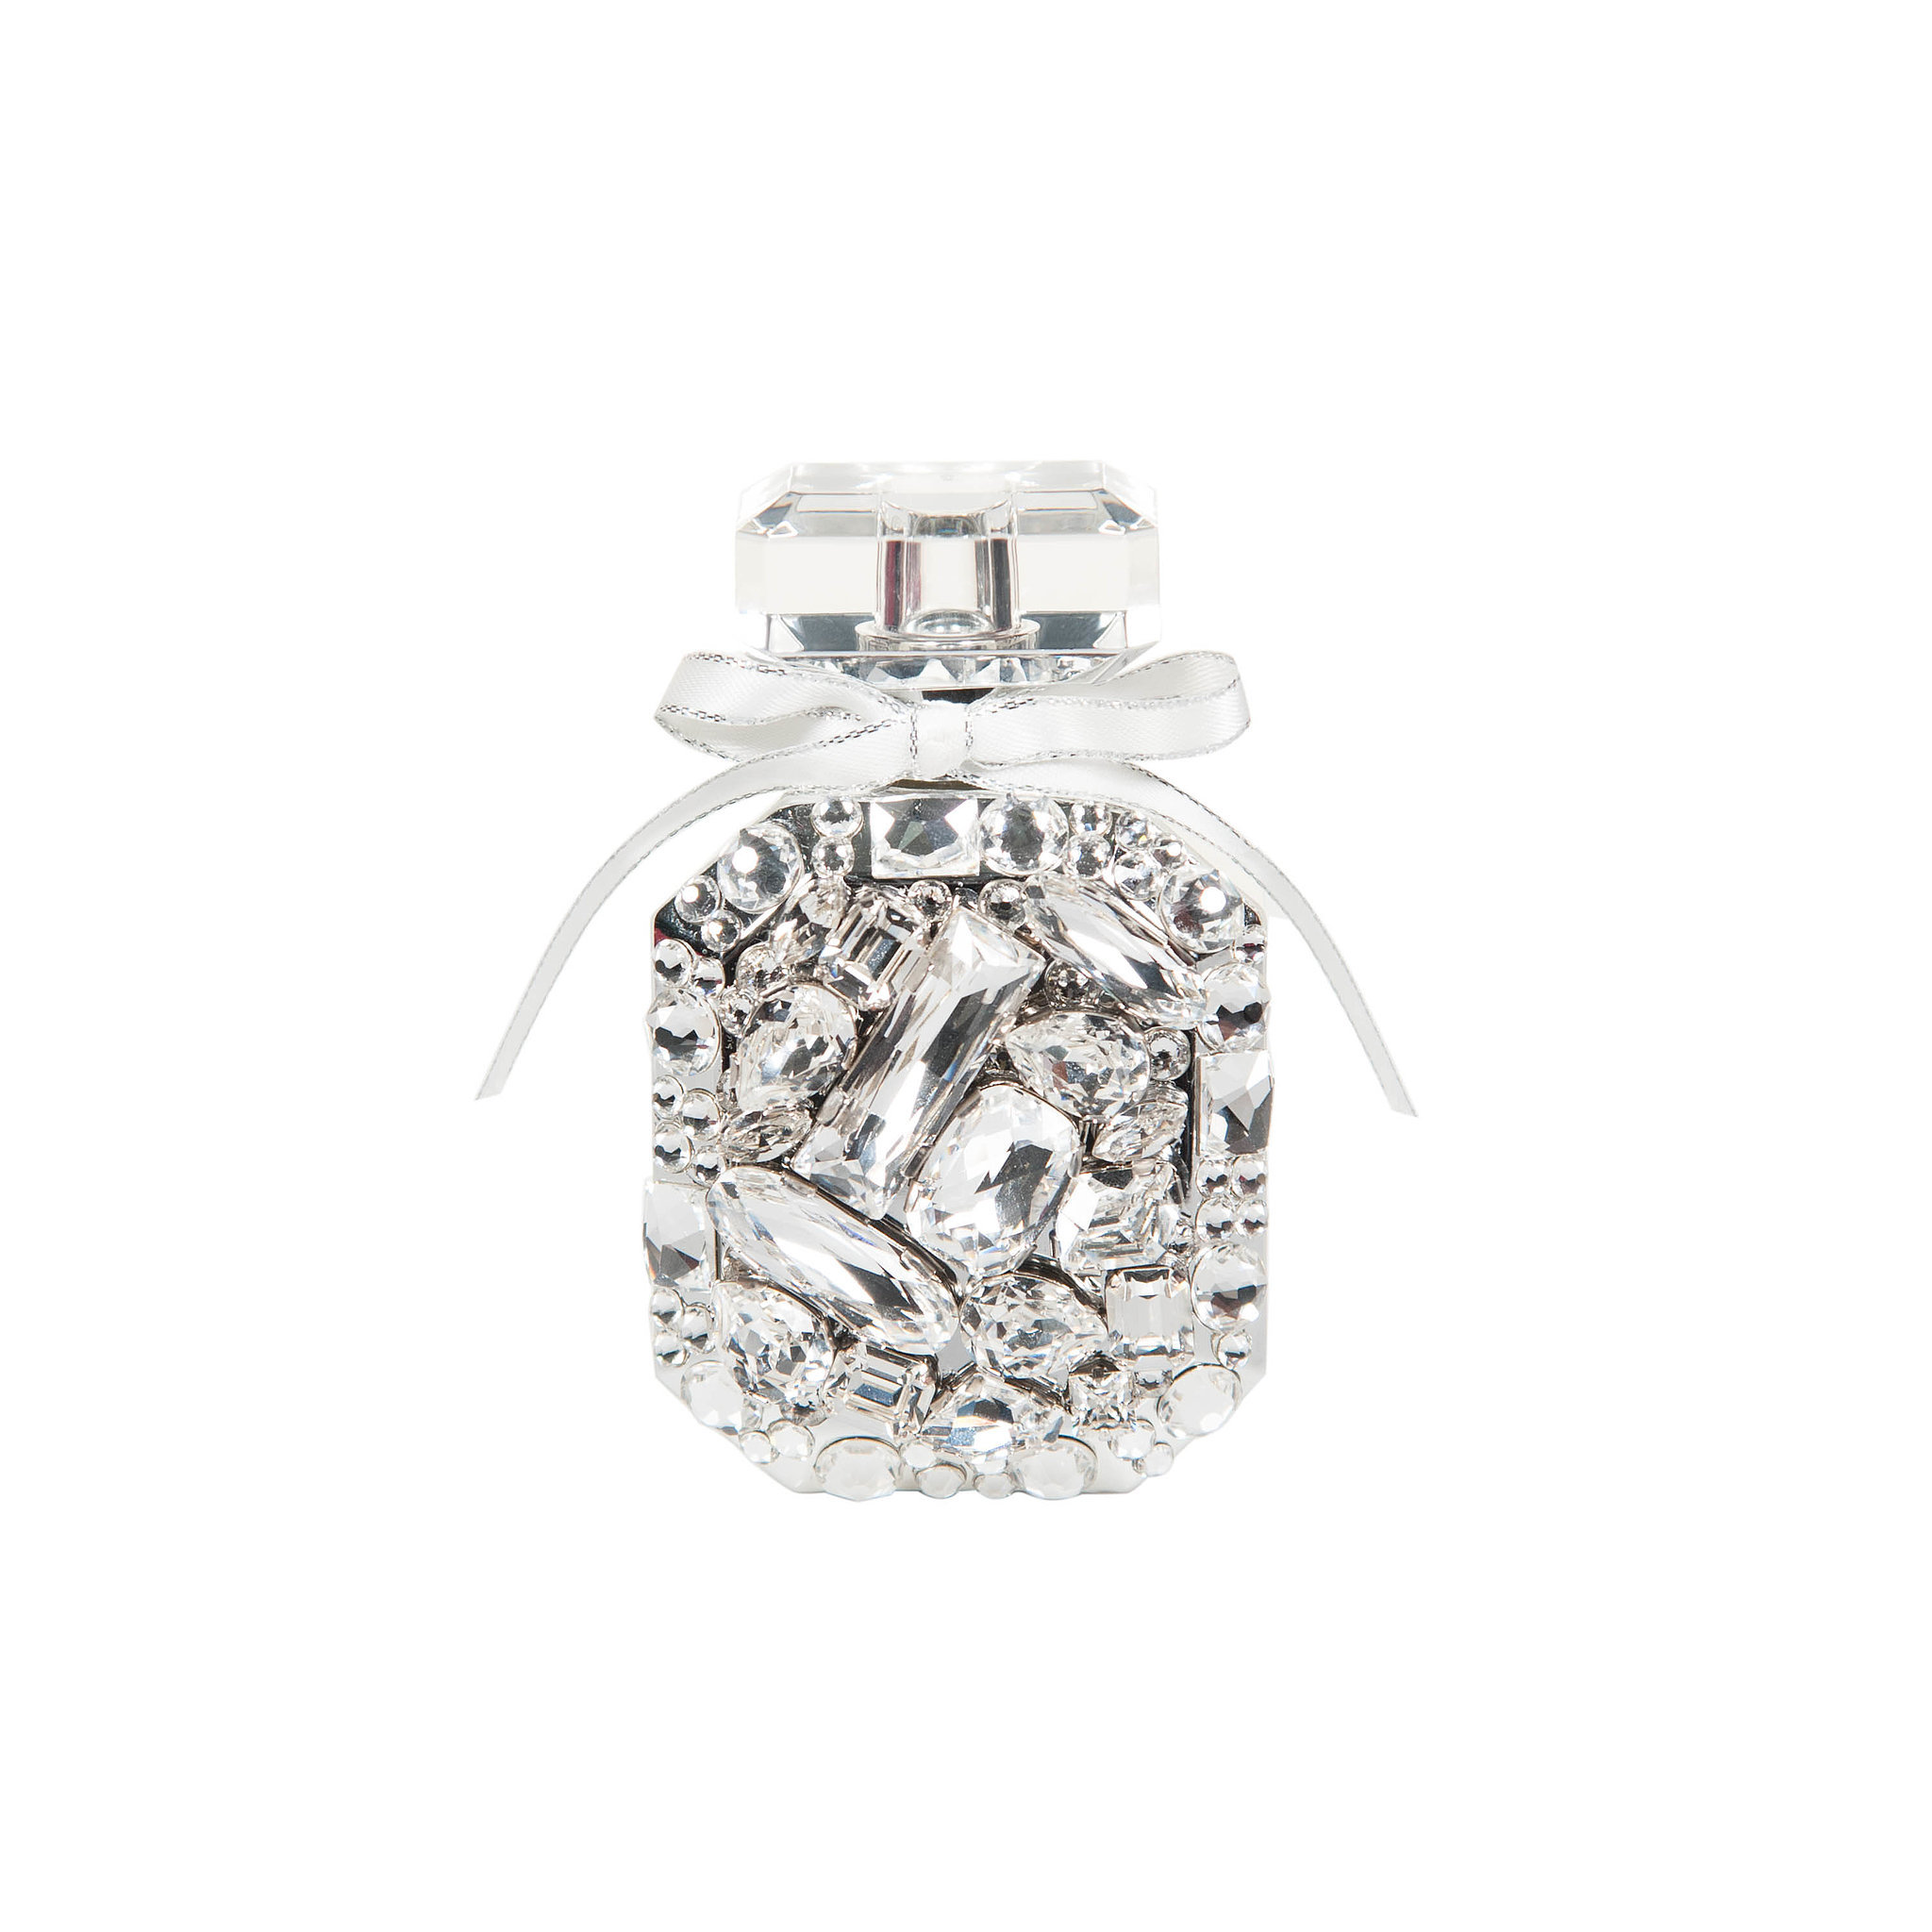 victoria u0026 39 s secret bombshell luxe perfume